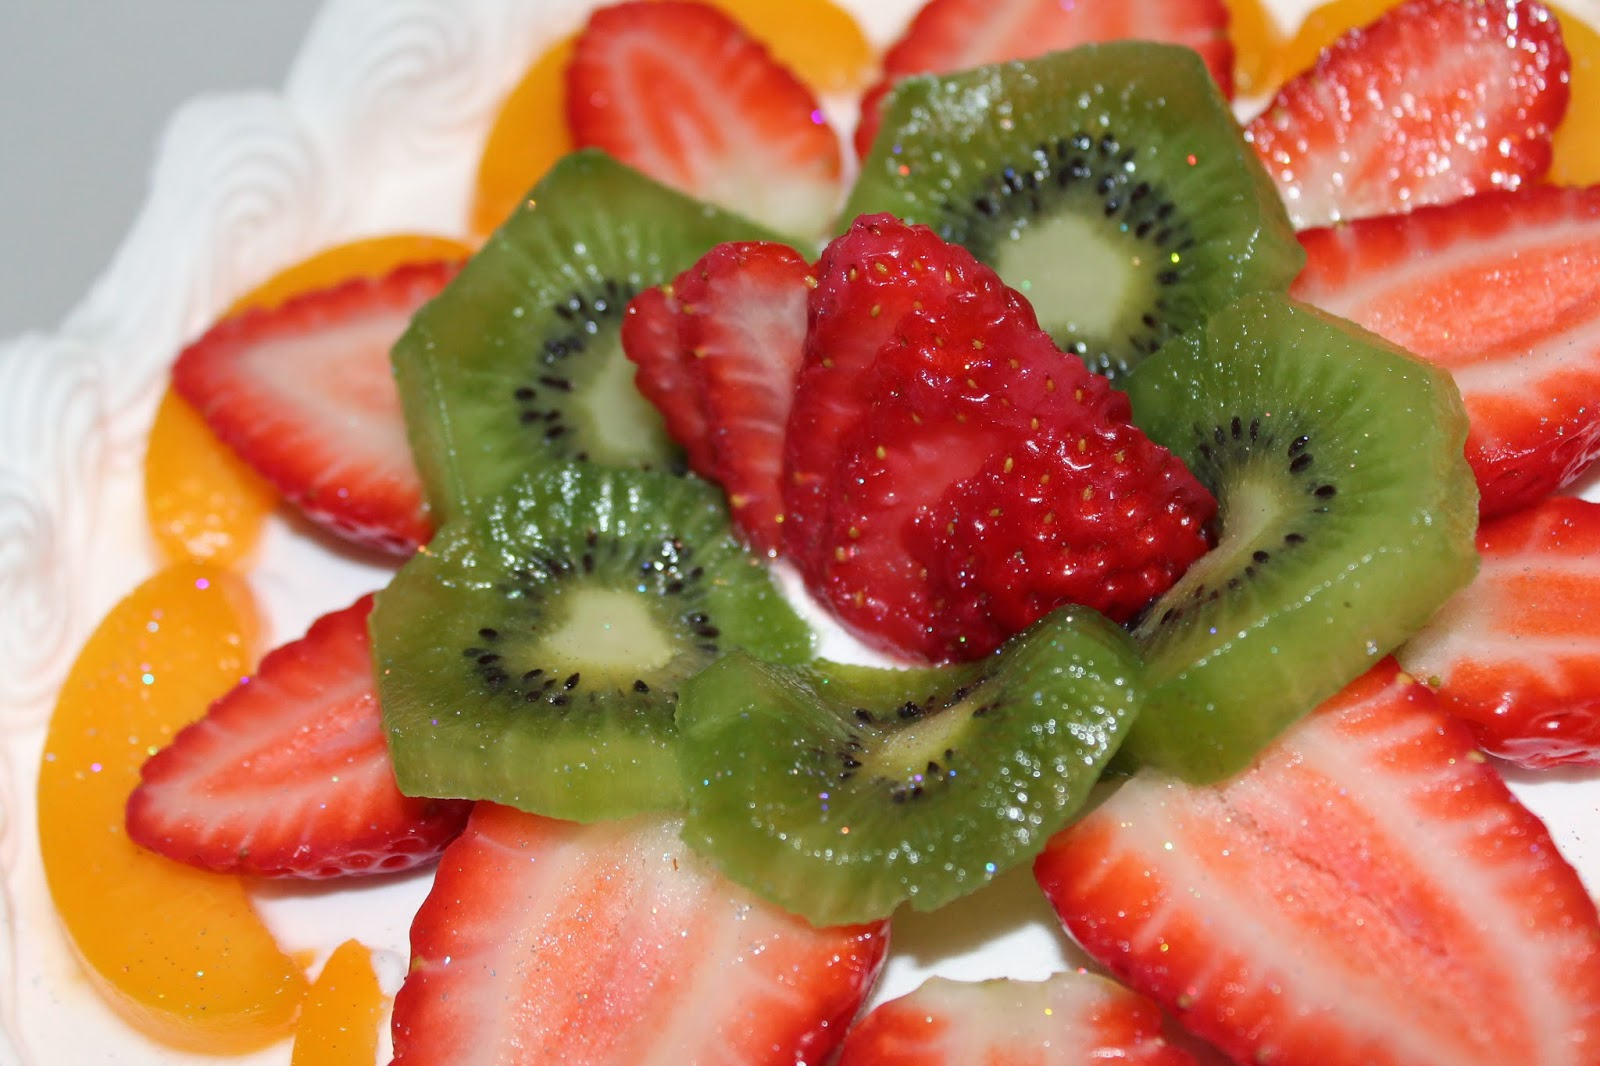 Tarta de fresa fria - sol23 - Receta - Canal Cocina